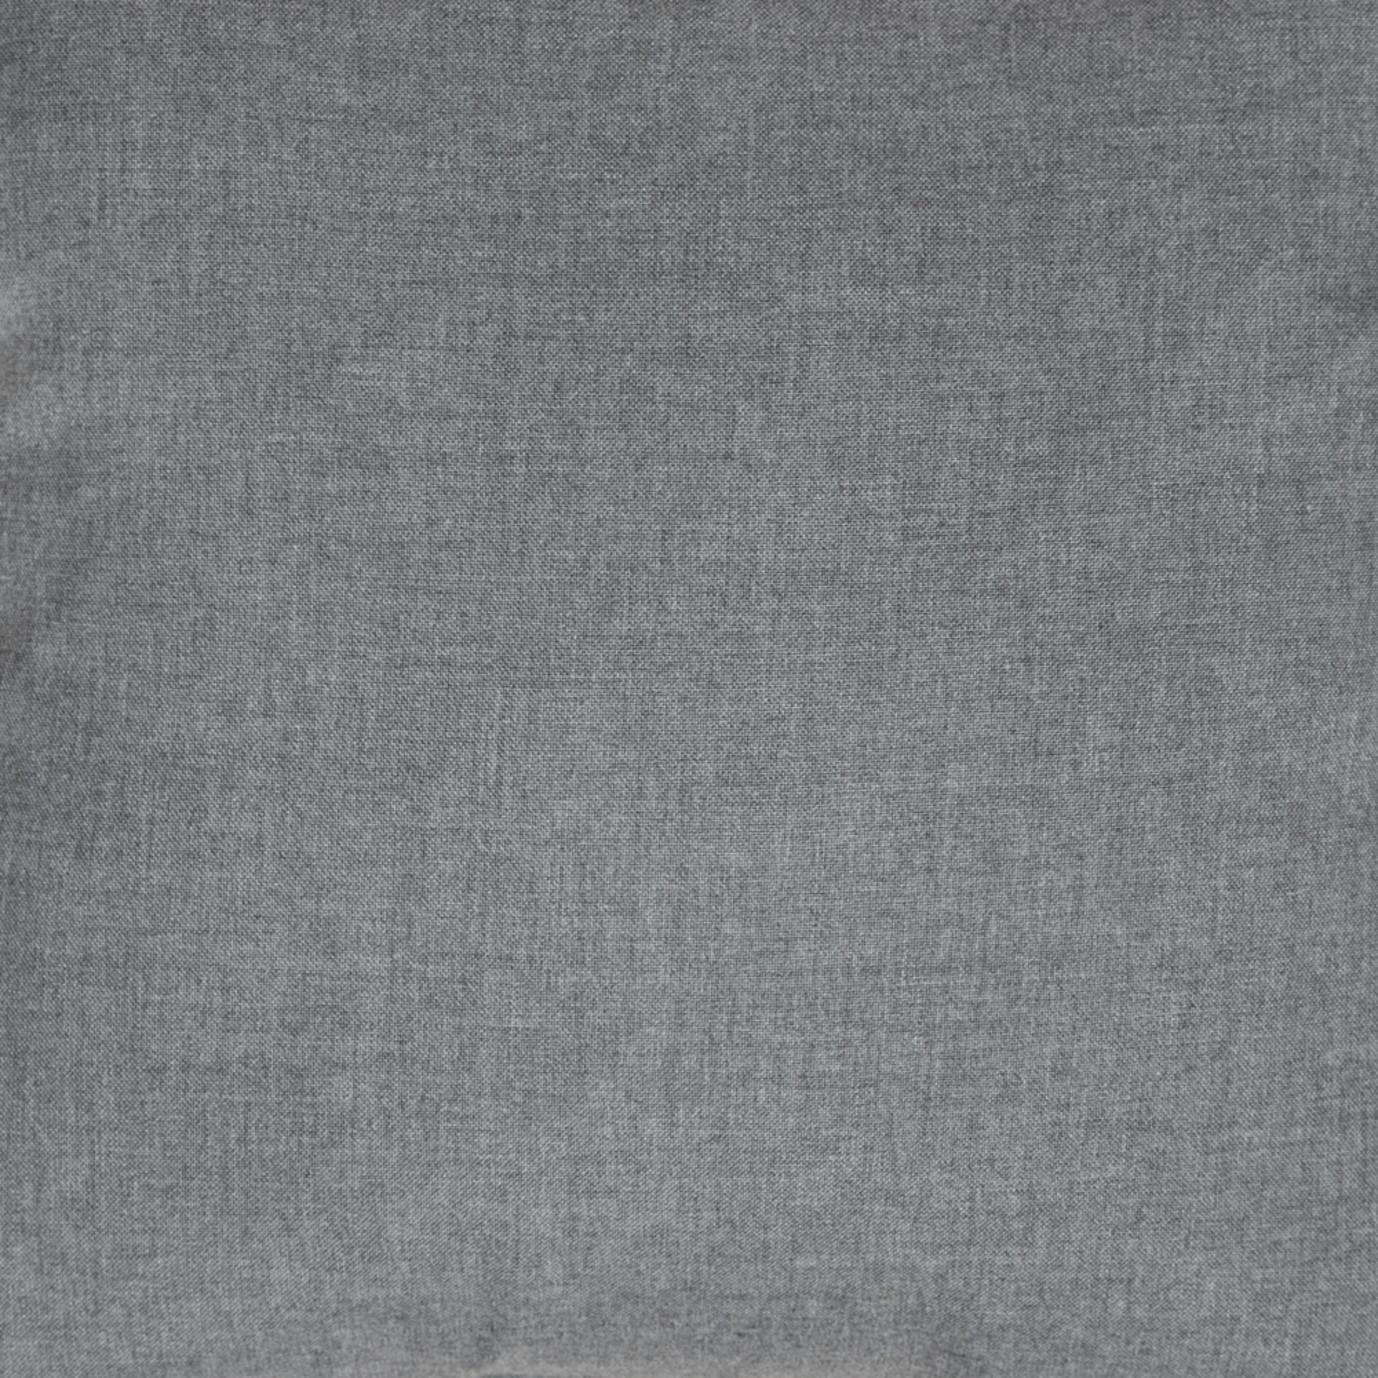 Deco™ 9pc Dining Set - Sunflower Grey